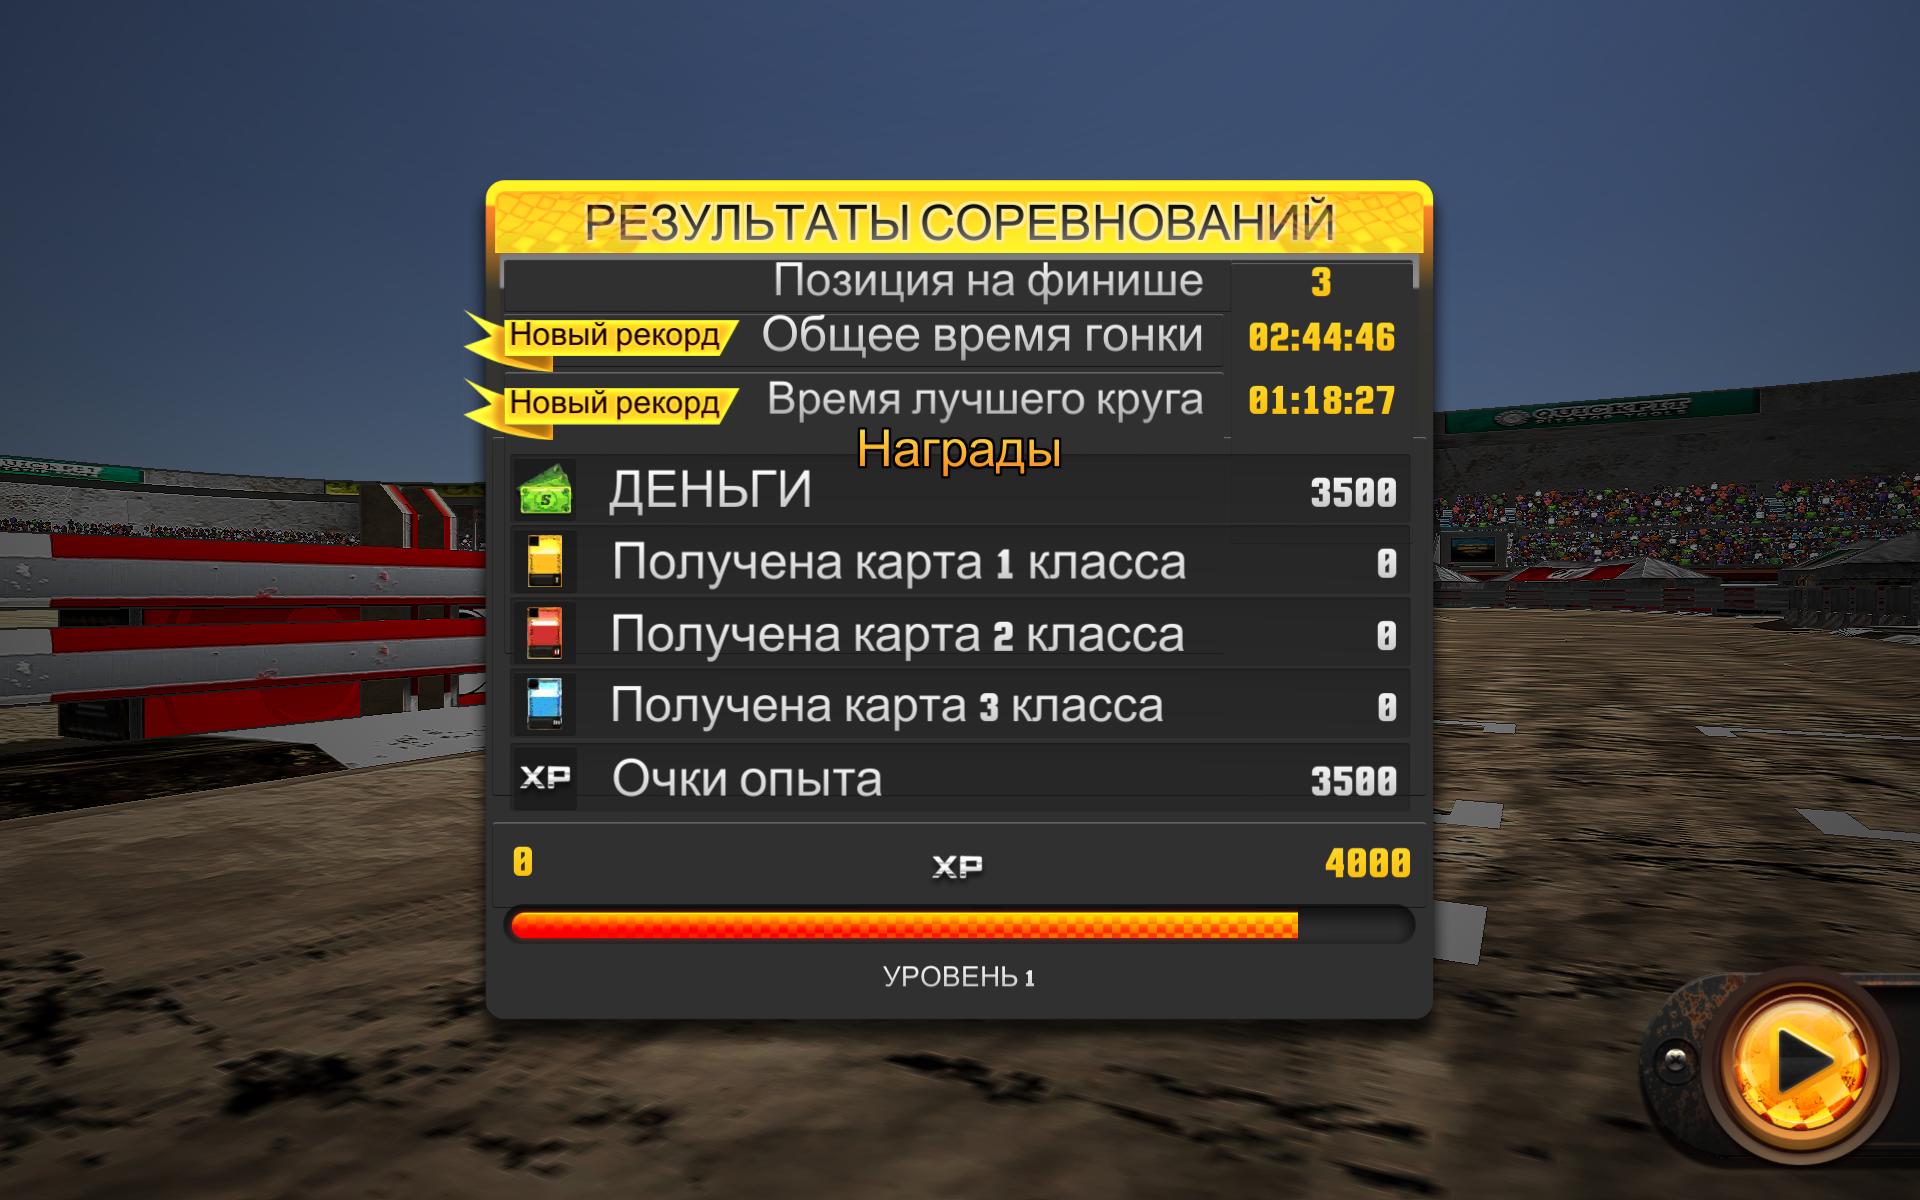 http://i5.imageban.ru/out/2018/01/14/ec3aefe4b33723c861acc05a3eee20a8.png